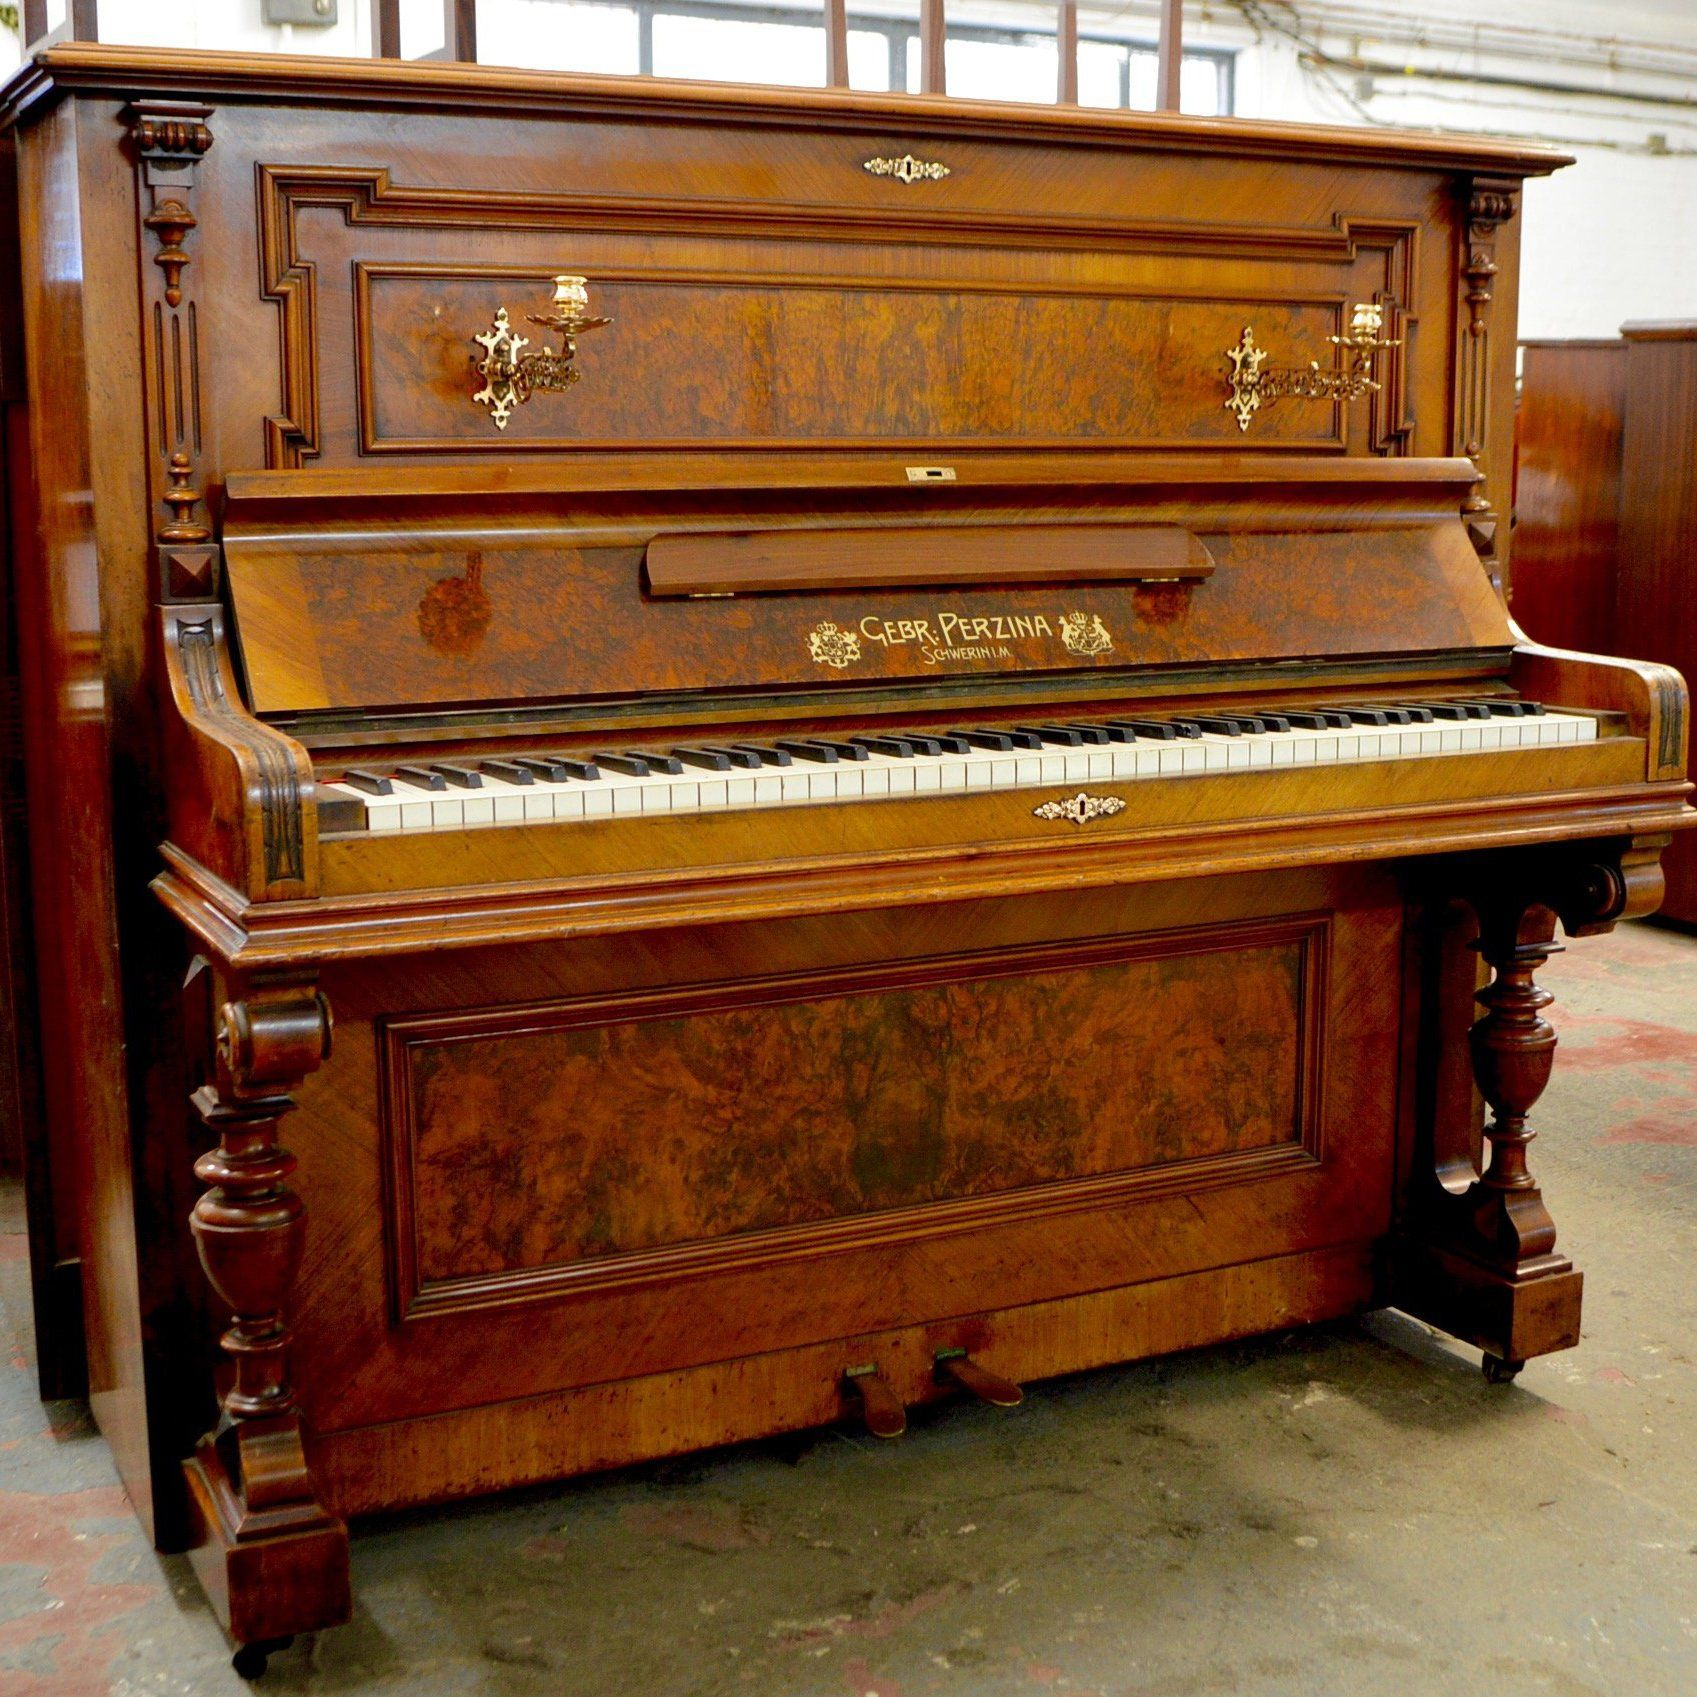 A German Made Upright Piano Upright Piano Piano Walnut Cabinets